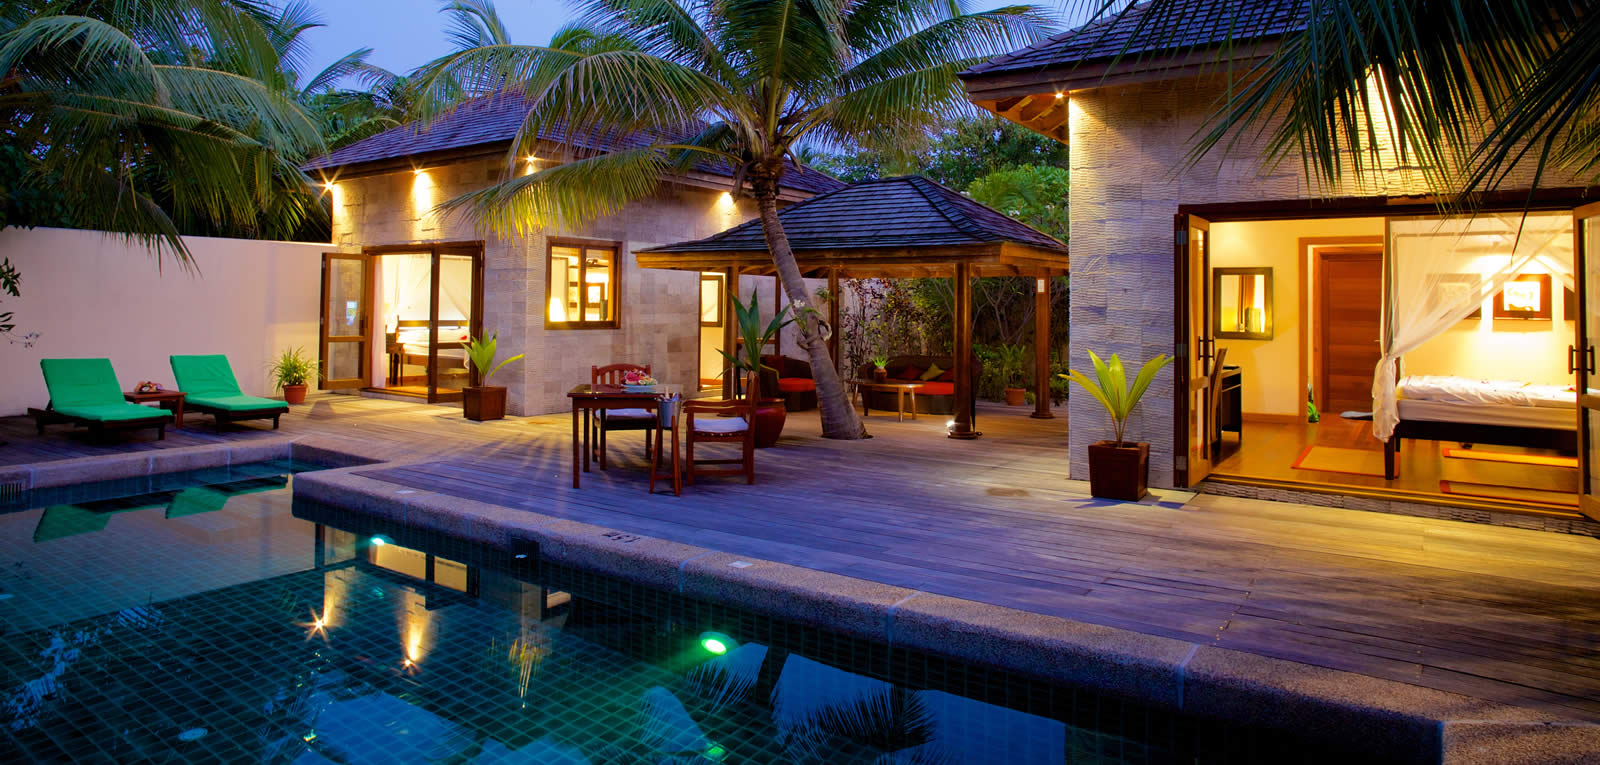 A Range Of Accommodation Options At Kuredu Maldives Resort